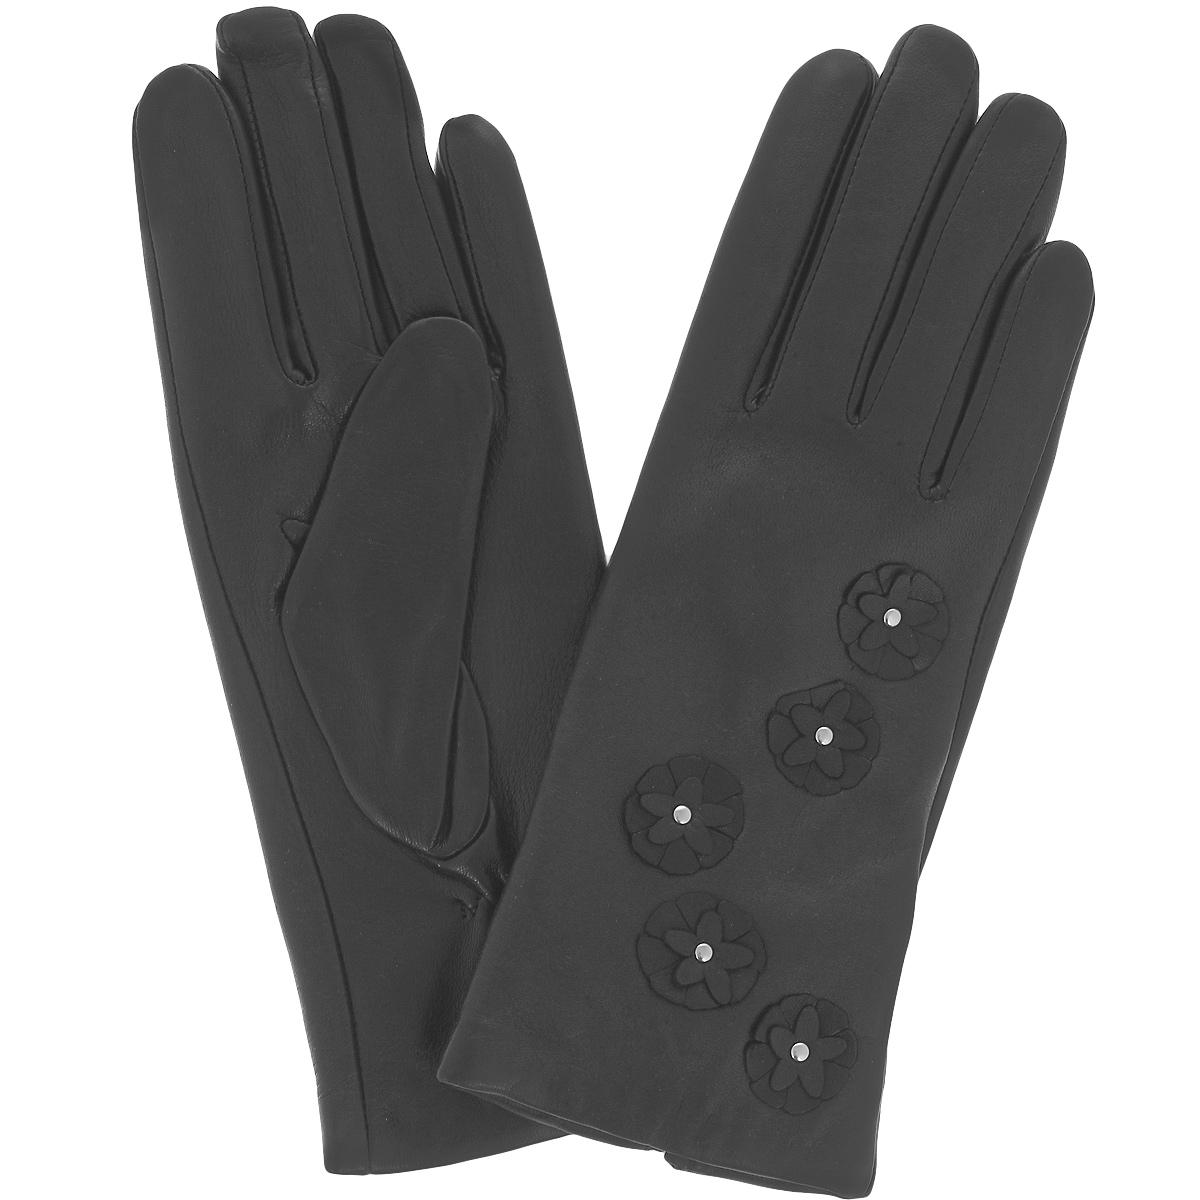 Фото - Перчатки женские Dali Exclusive, цвет: черный. 11_CAMPA/BL. Размер 6,5 женские перчатки imixlot acylic ca02009 mu